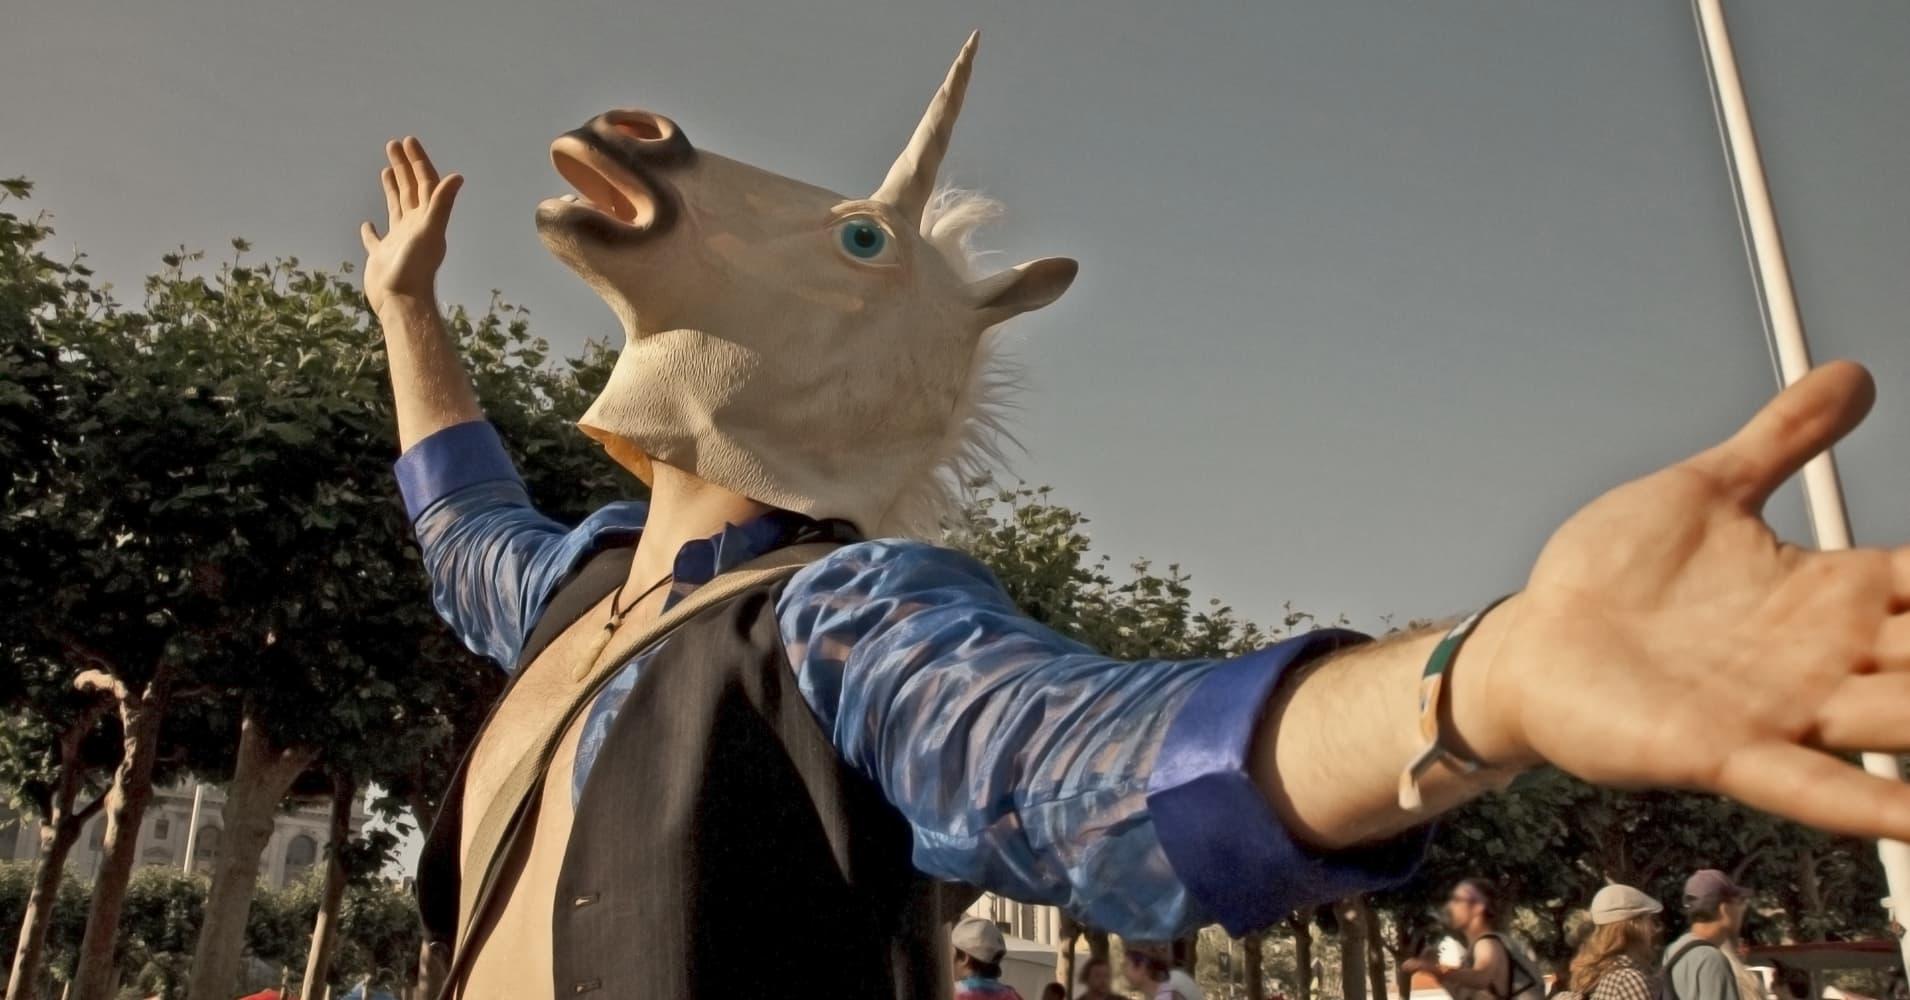 Blue apron unicorn - Blue Apron Unicorn 76